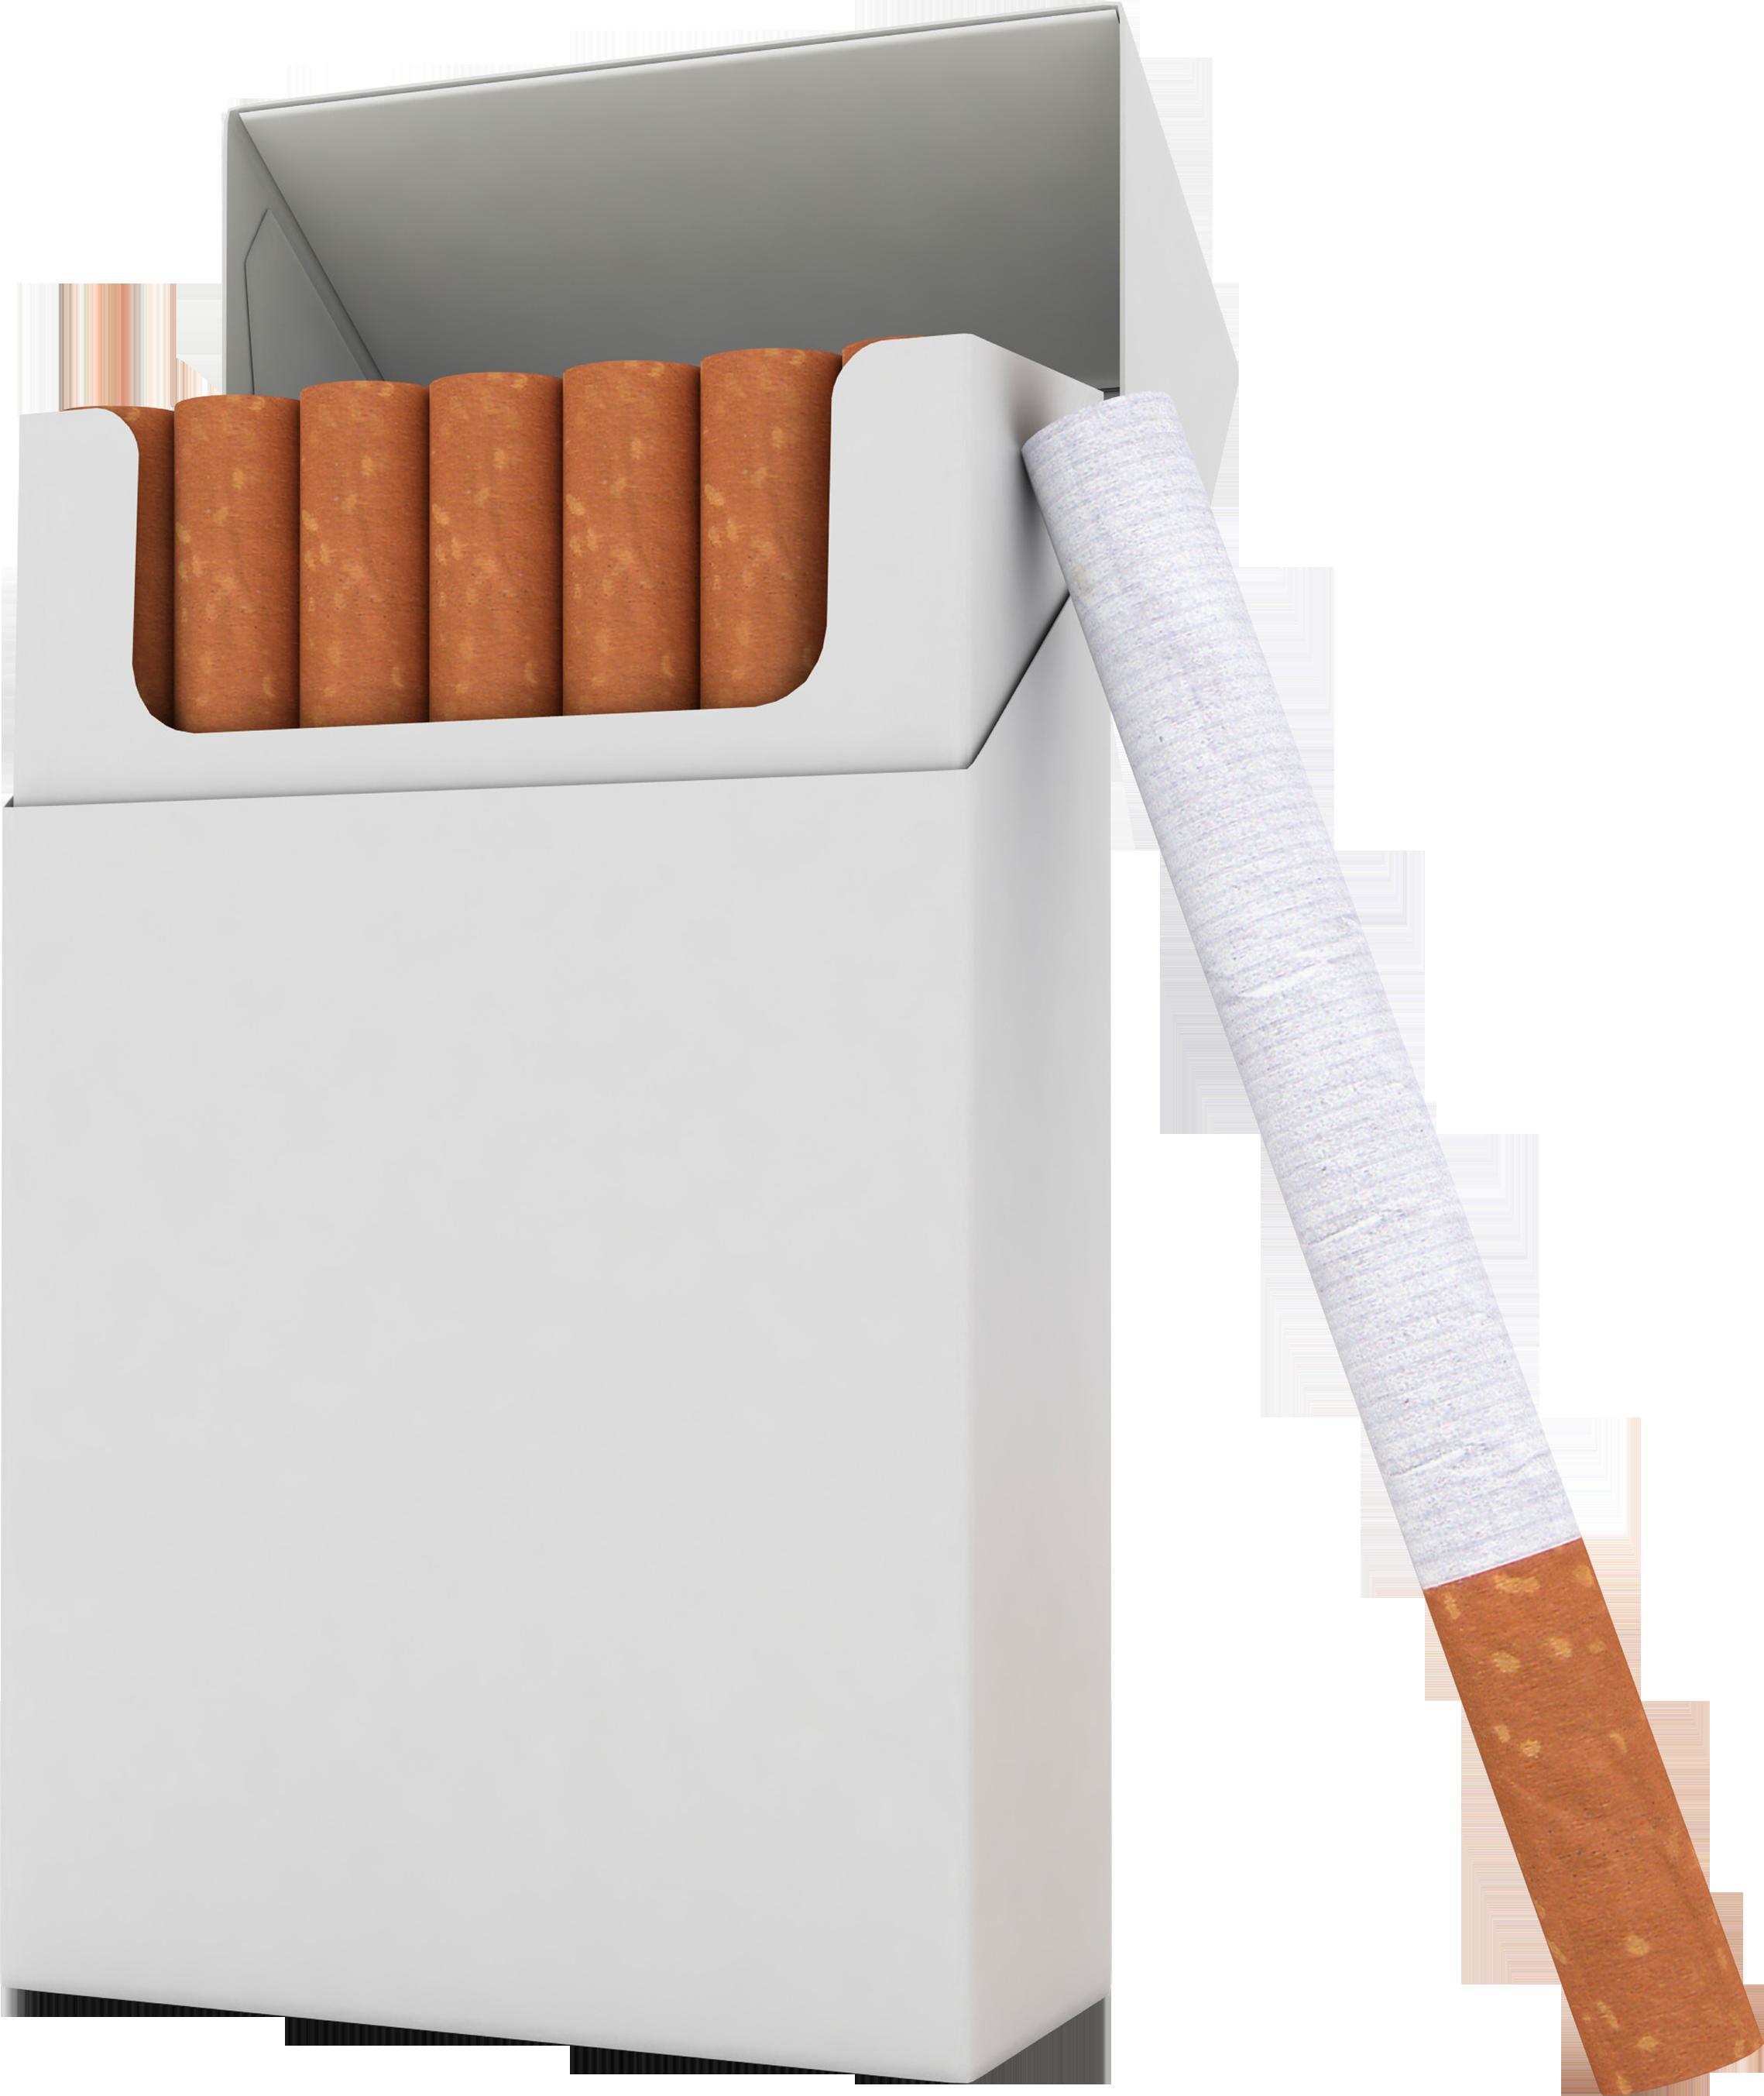 Drawn cigarette transparent background #11